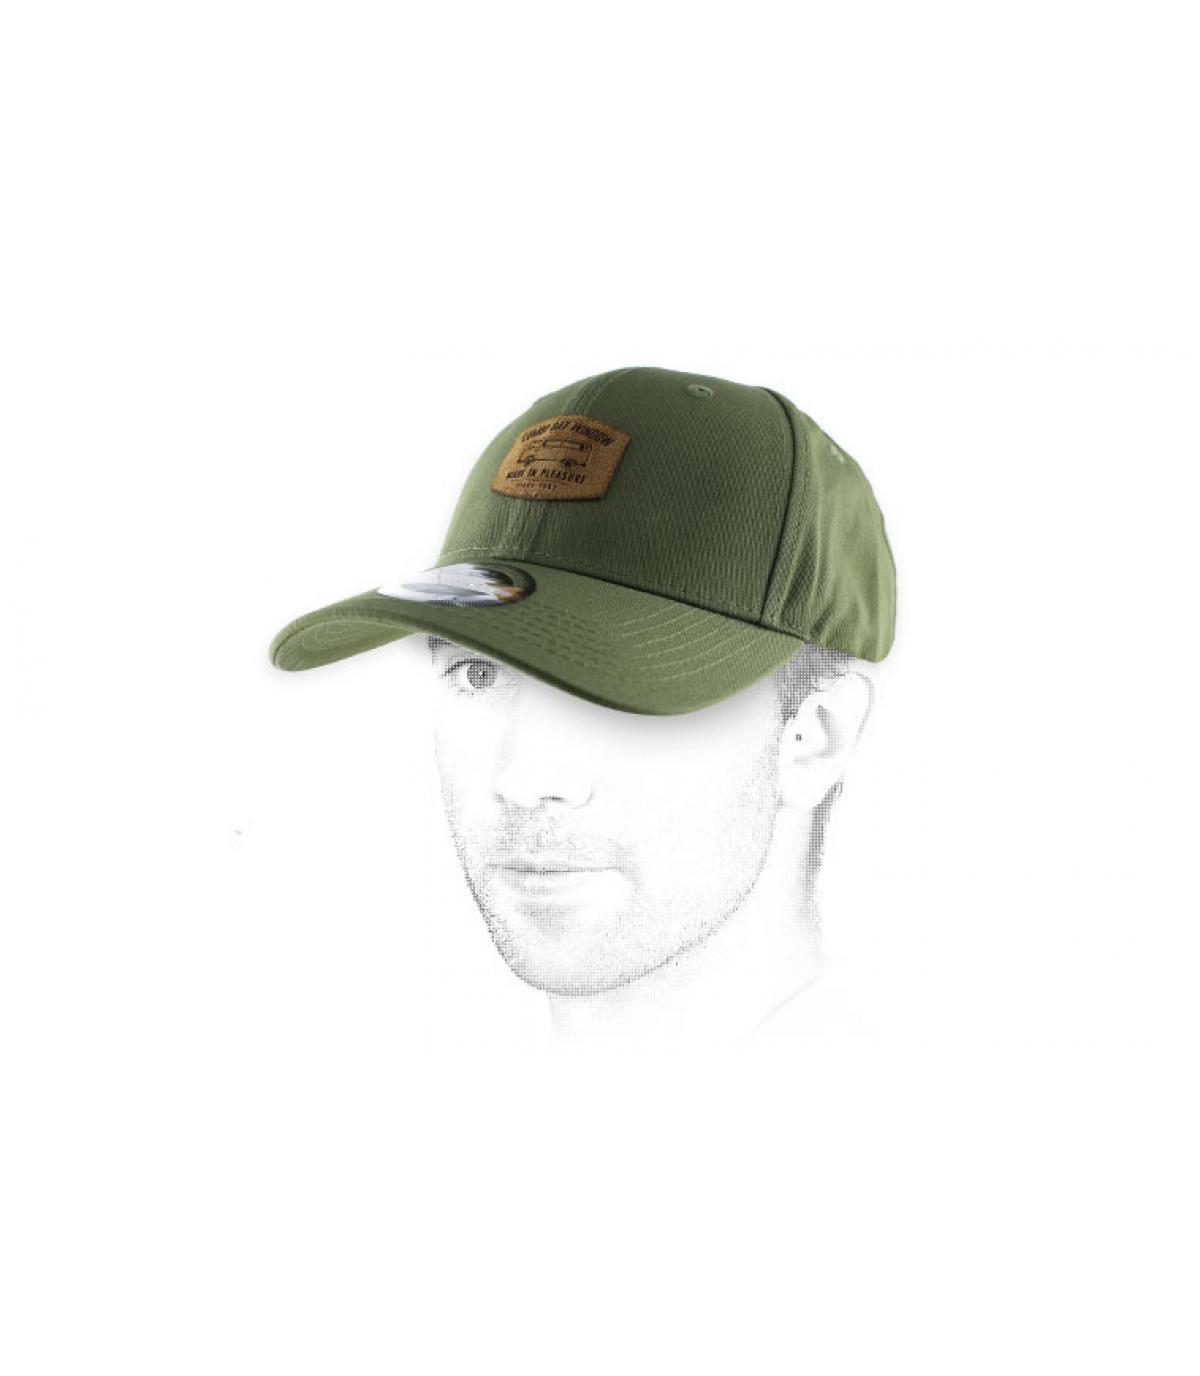 gorra curva Combi de oliva